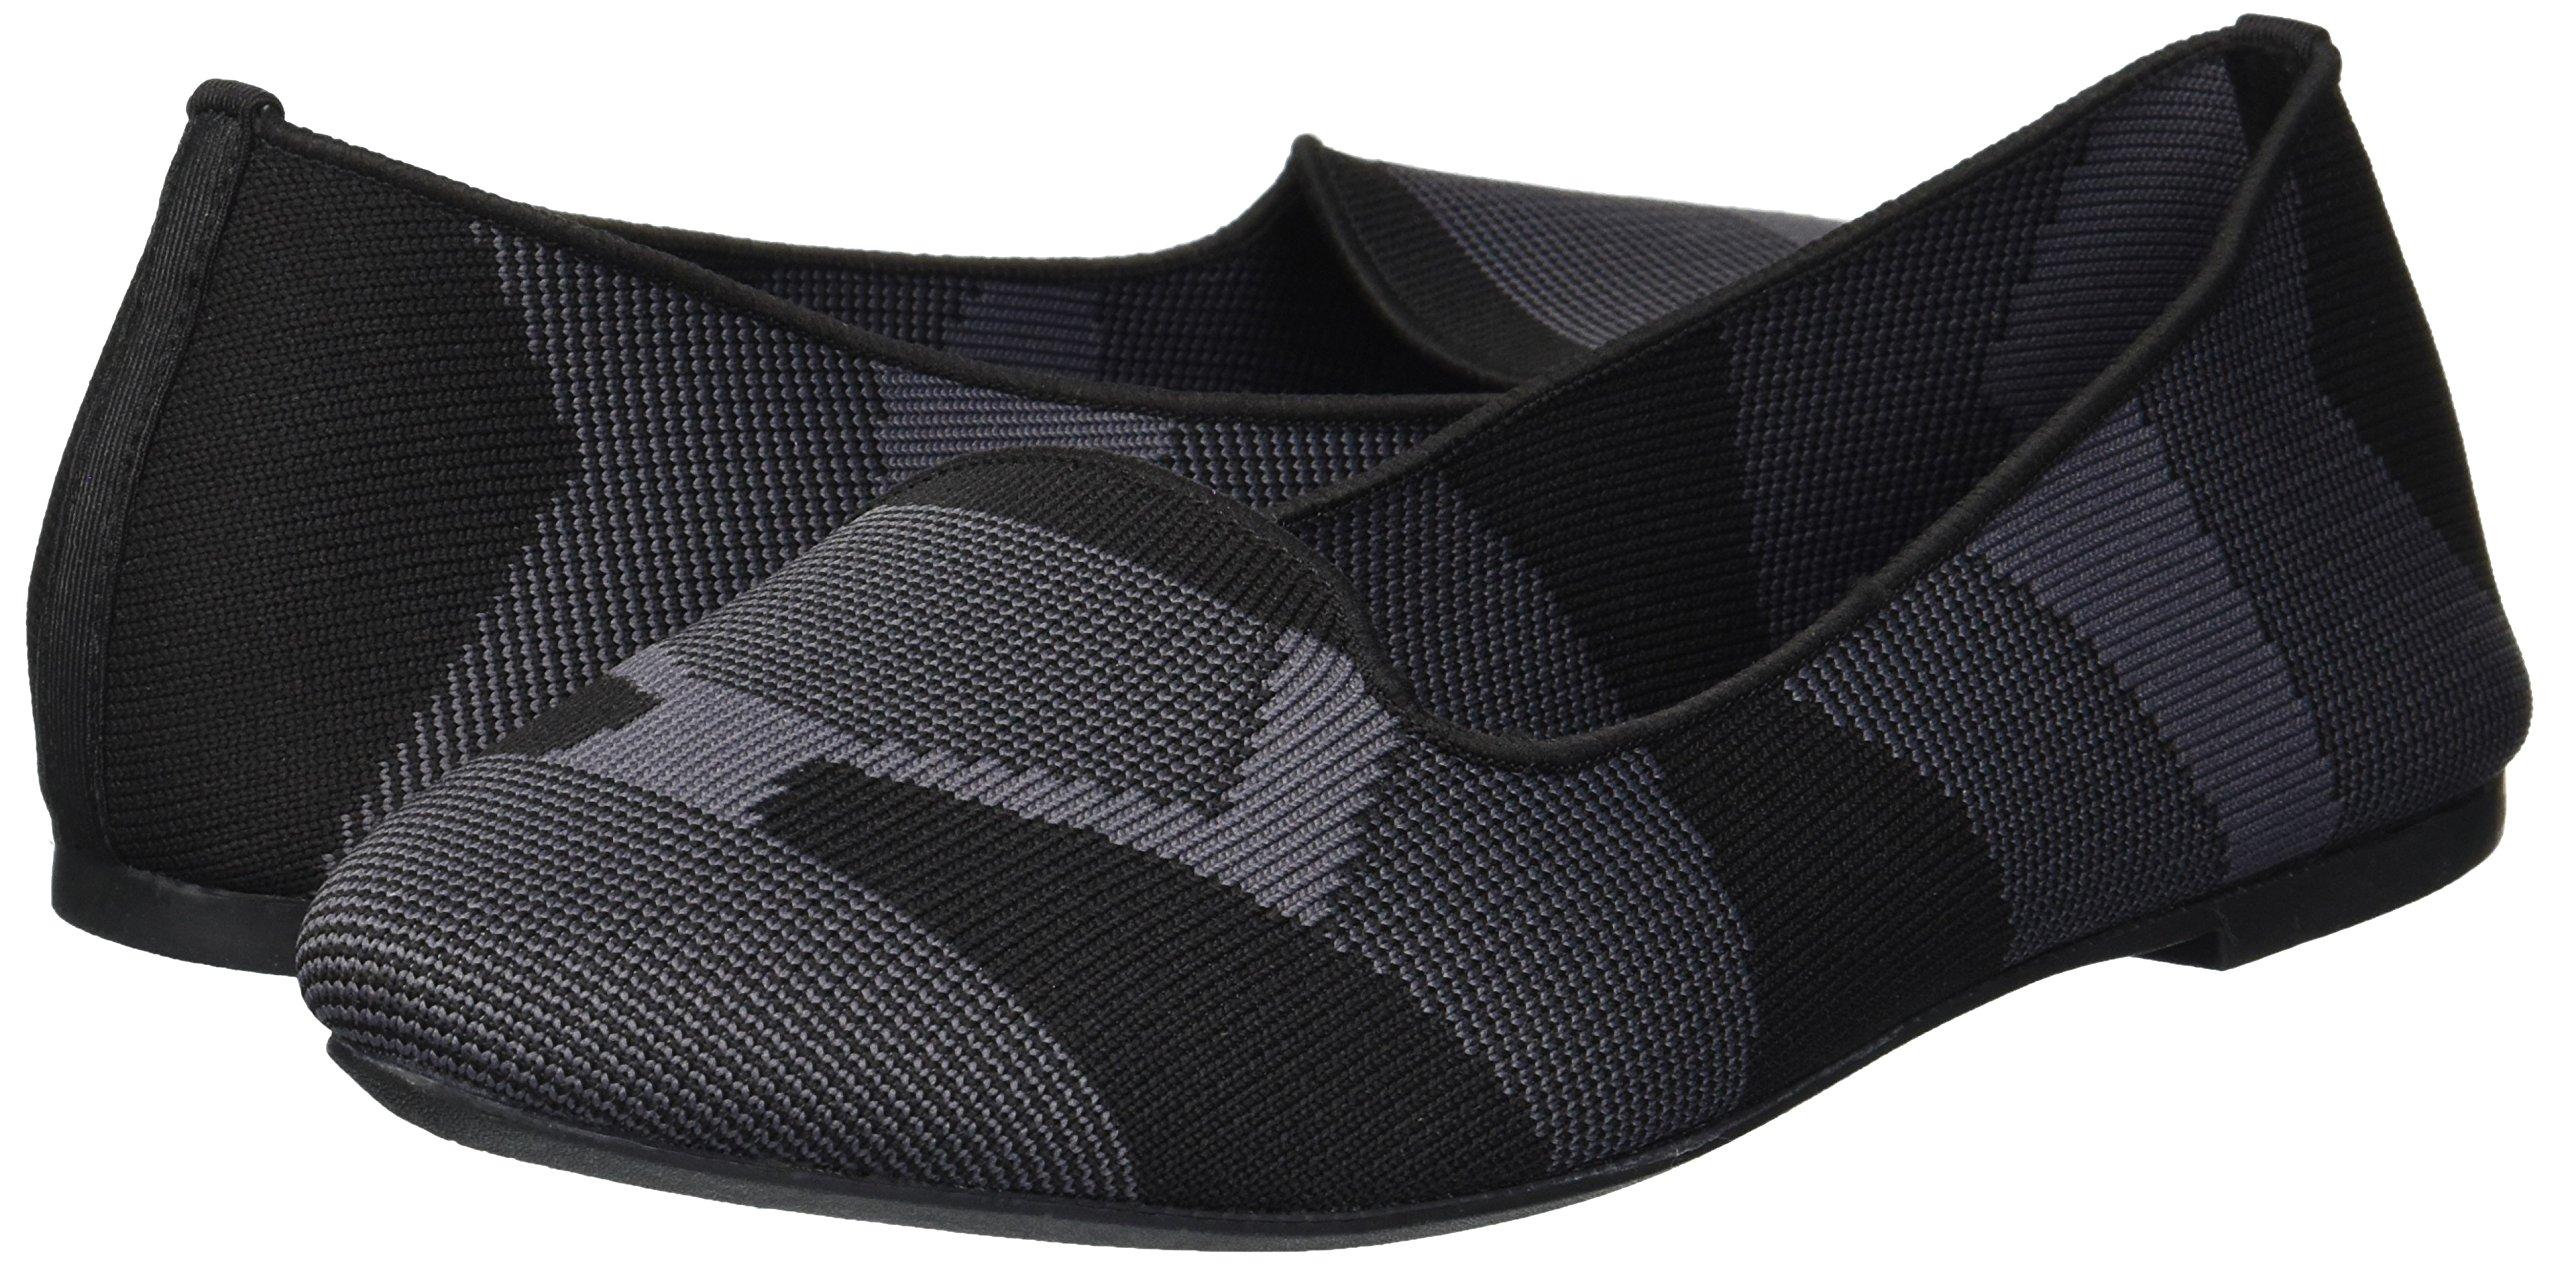 Skechers Women's Cleo-Sherlock-Engineered Knit Loafer Skimmer Ballet Flat, Black, 6.5 M US by Skechers (Image #5)